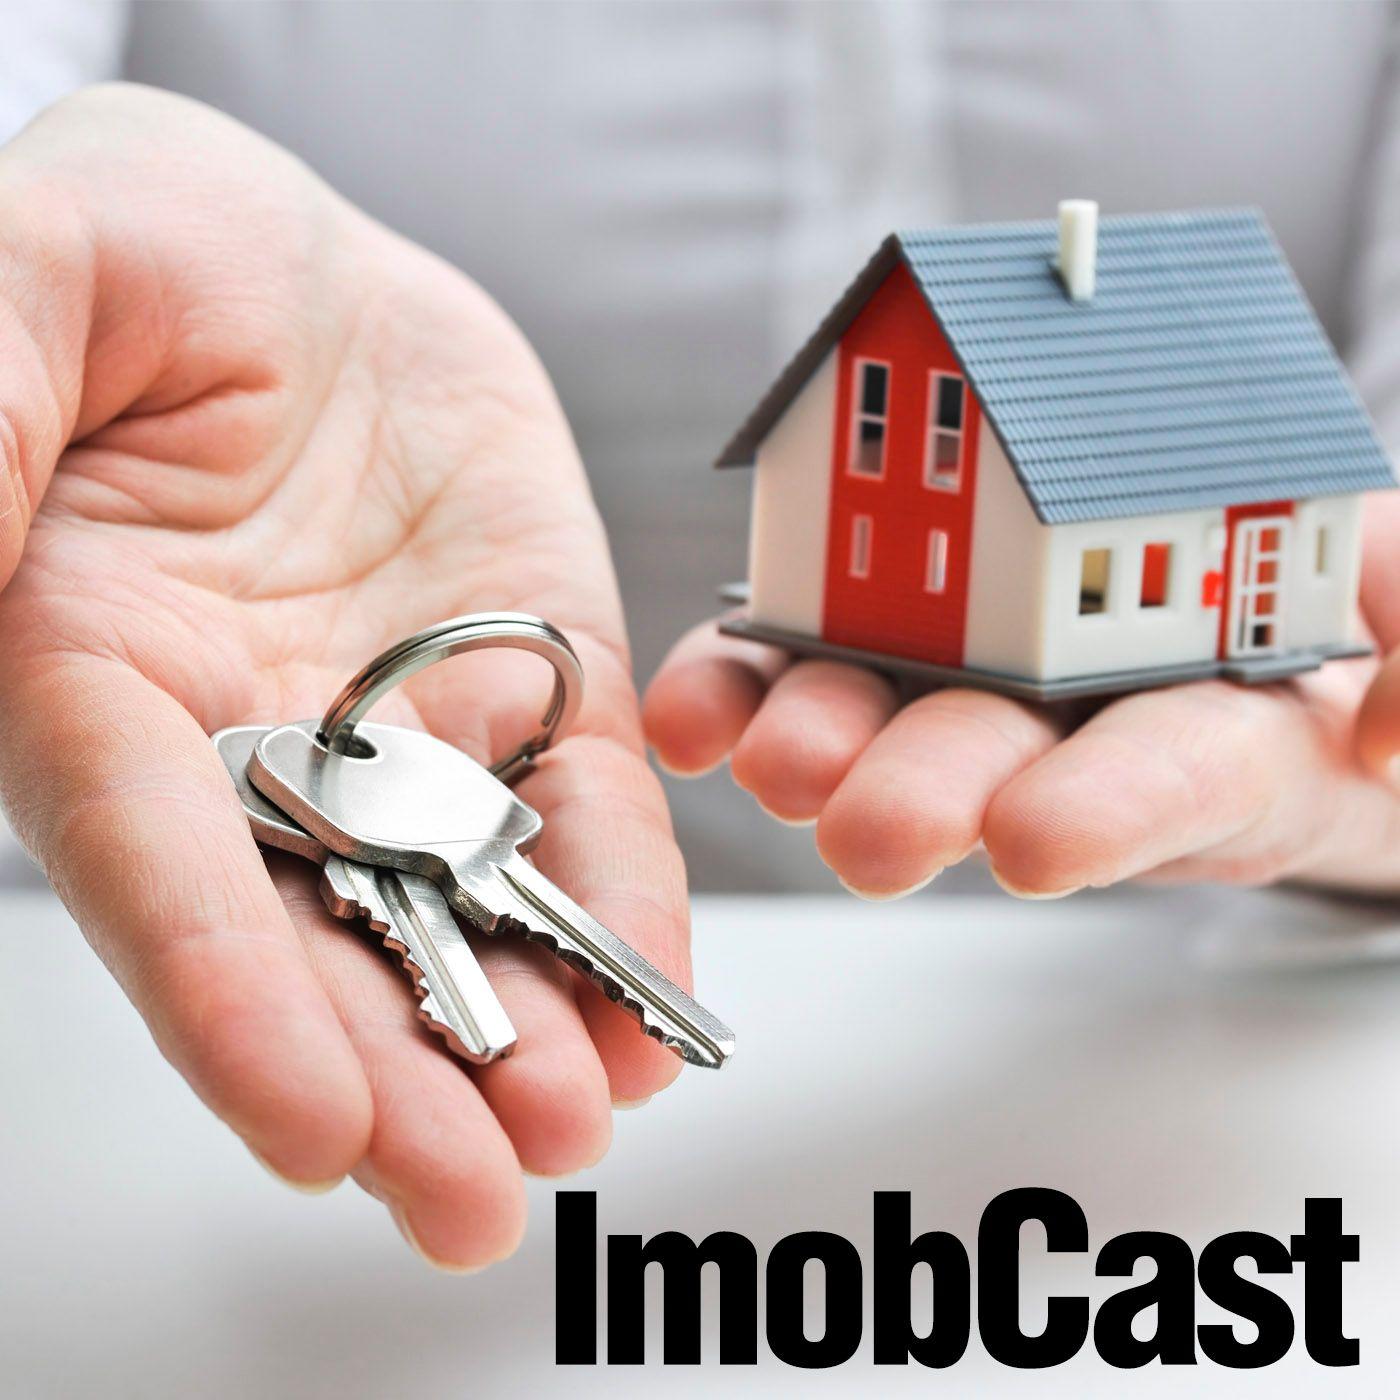 ImobCast